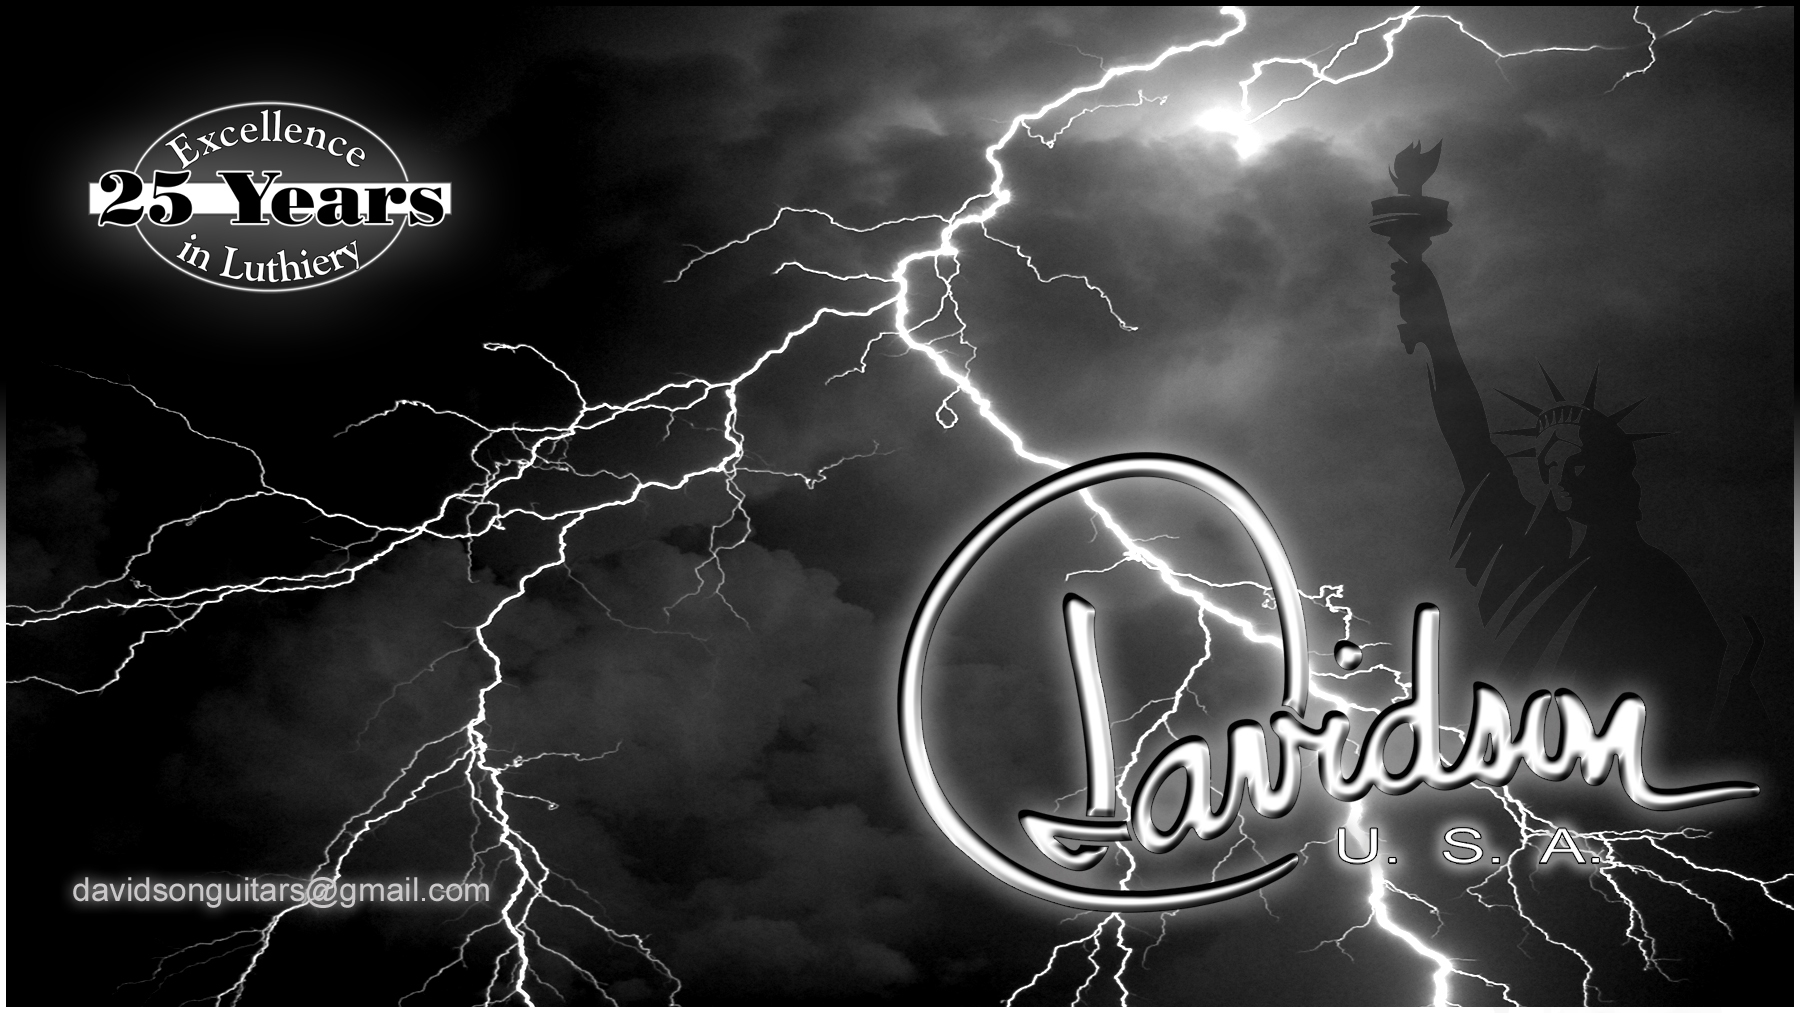 Davidson Guitars (@davidsonguitars) Cover Image